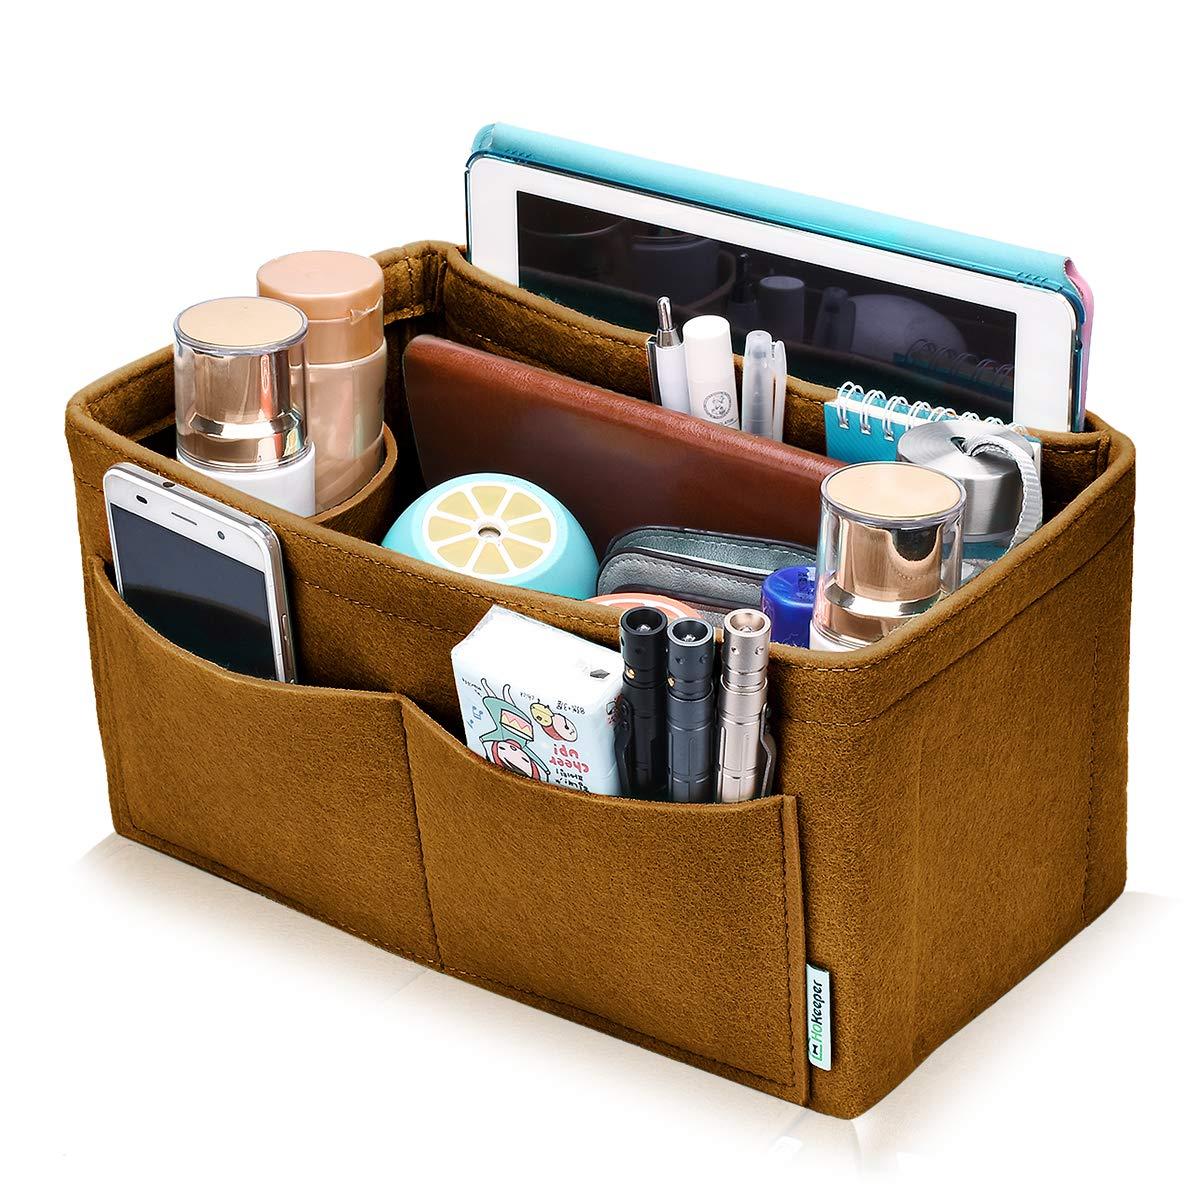 Hokeeper Felt Purse Insert Multi-pocket Organizer, Handbag Organizer, Bag in Bag, 11 Compartments, 4 Sizes, 6 Colors